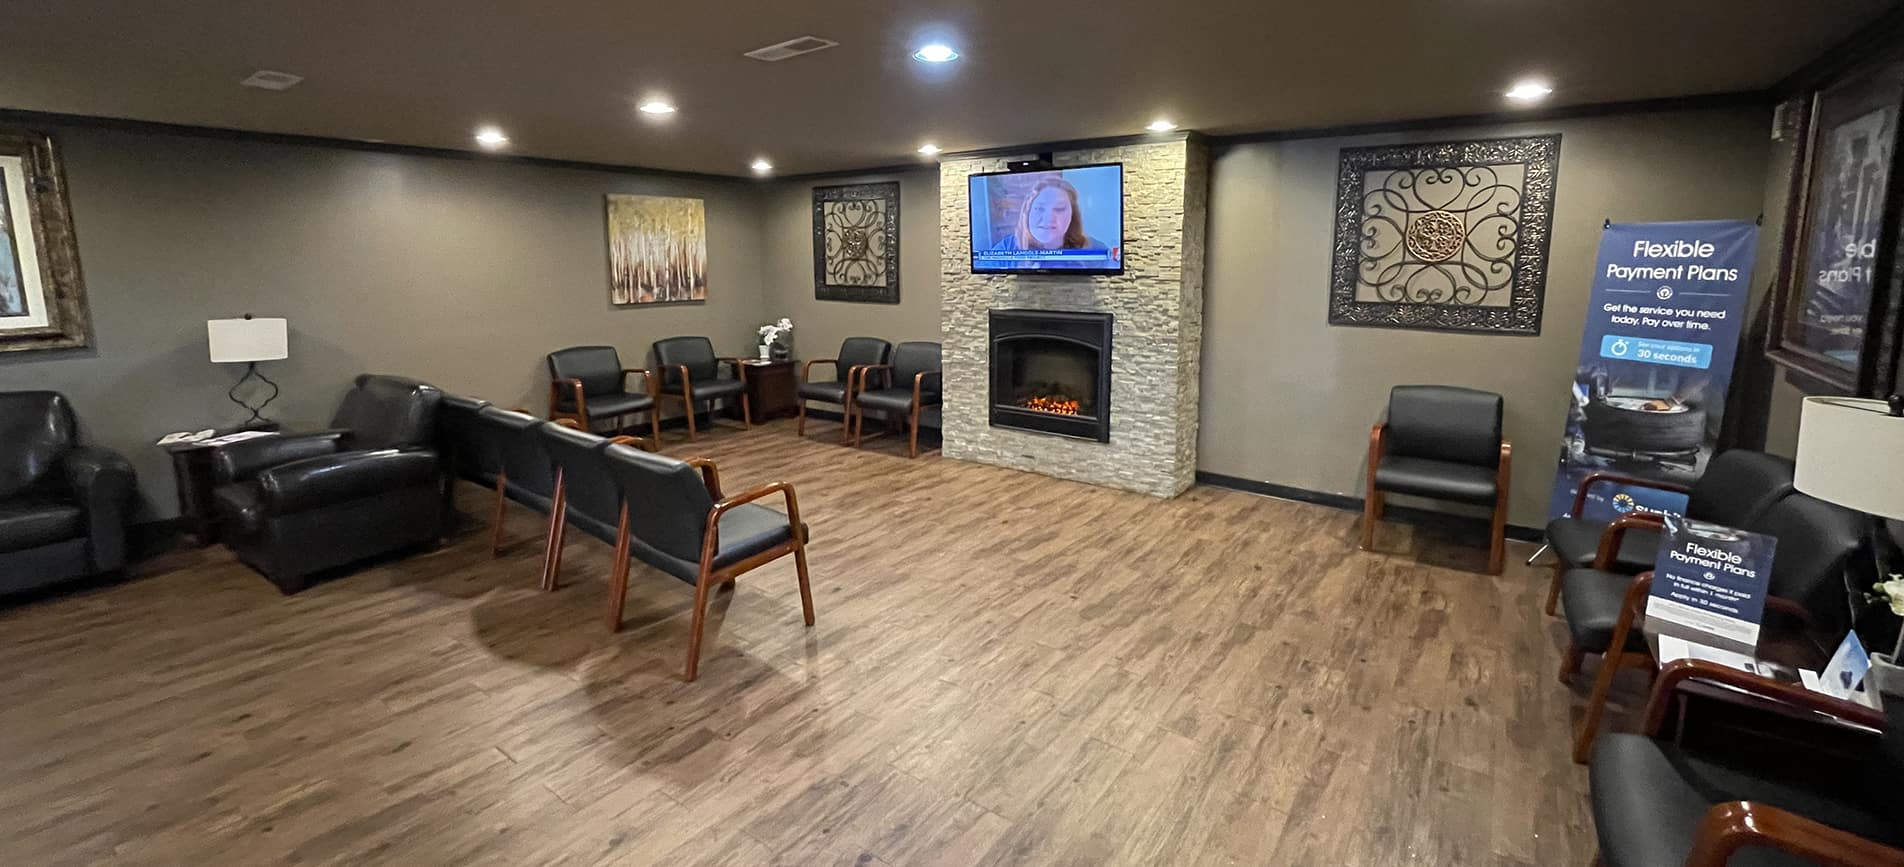 Gary FOrce Honda Waiting room